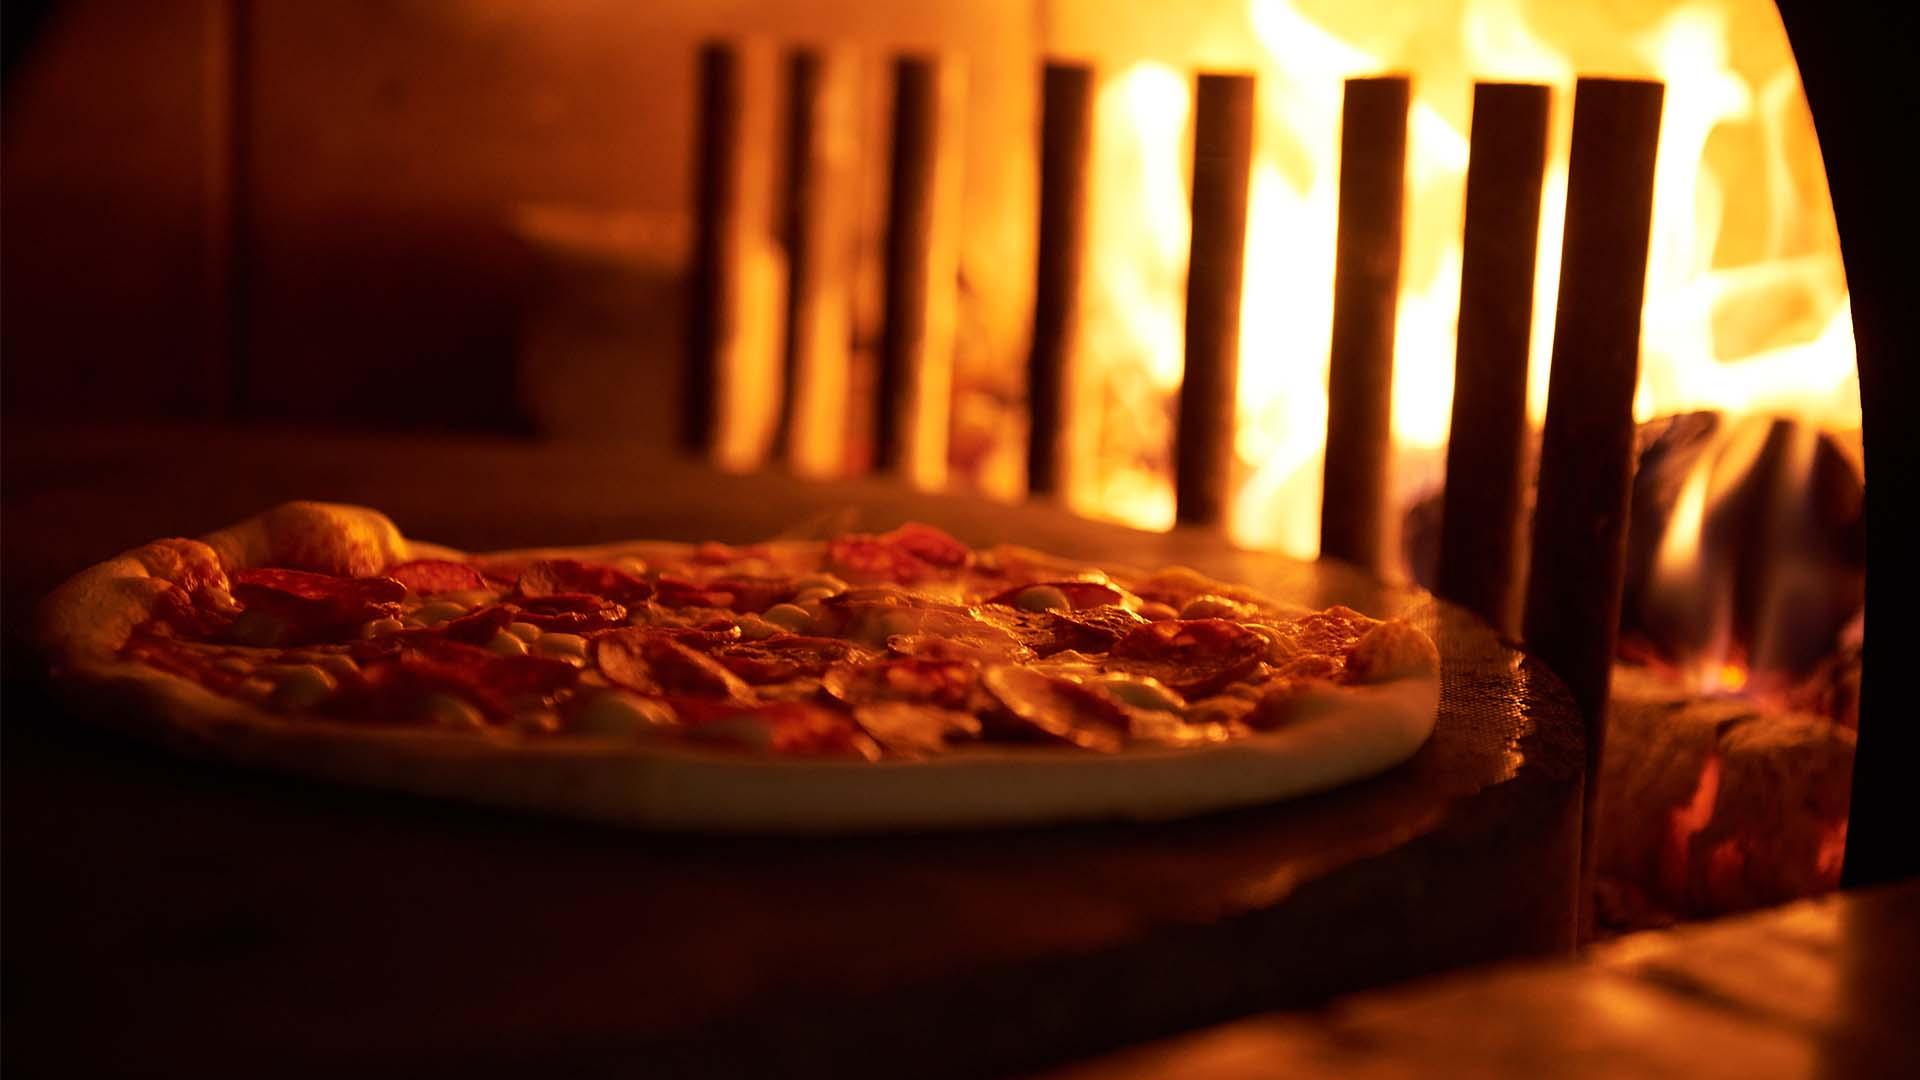 best pizza in broadway market hackney